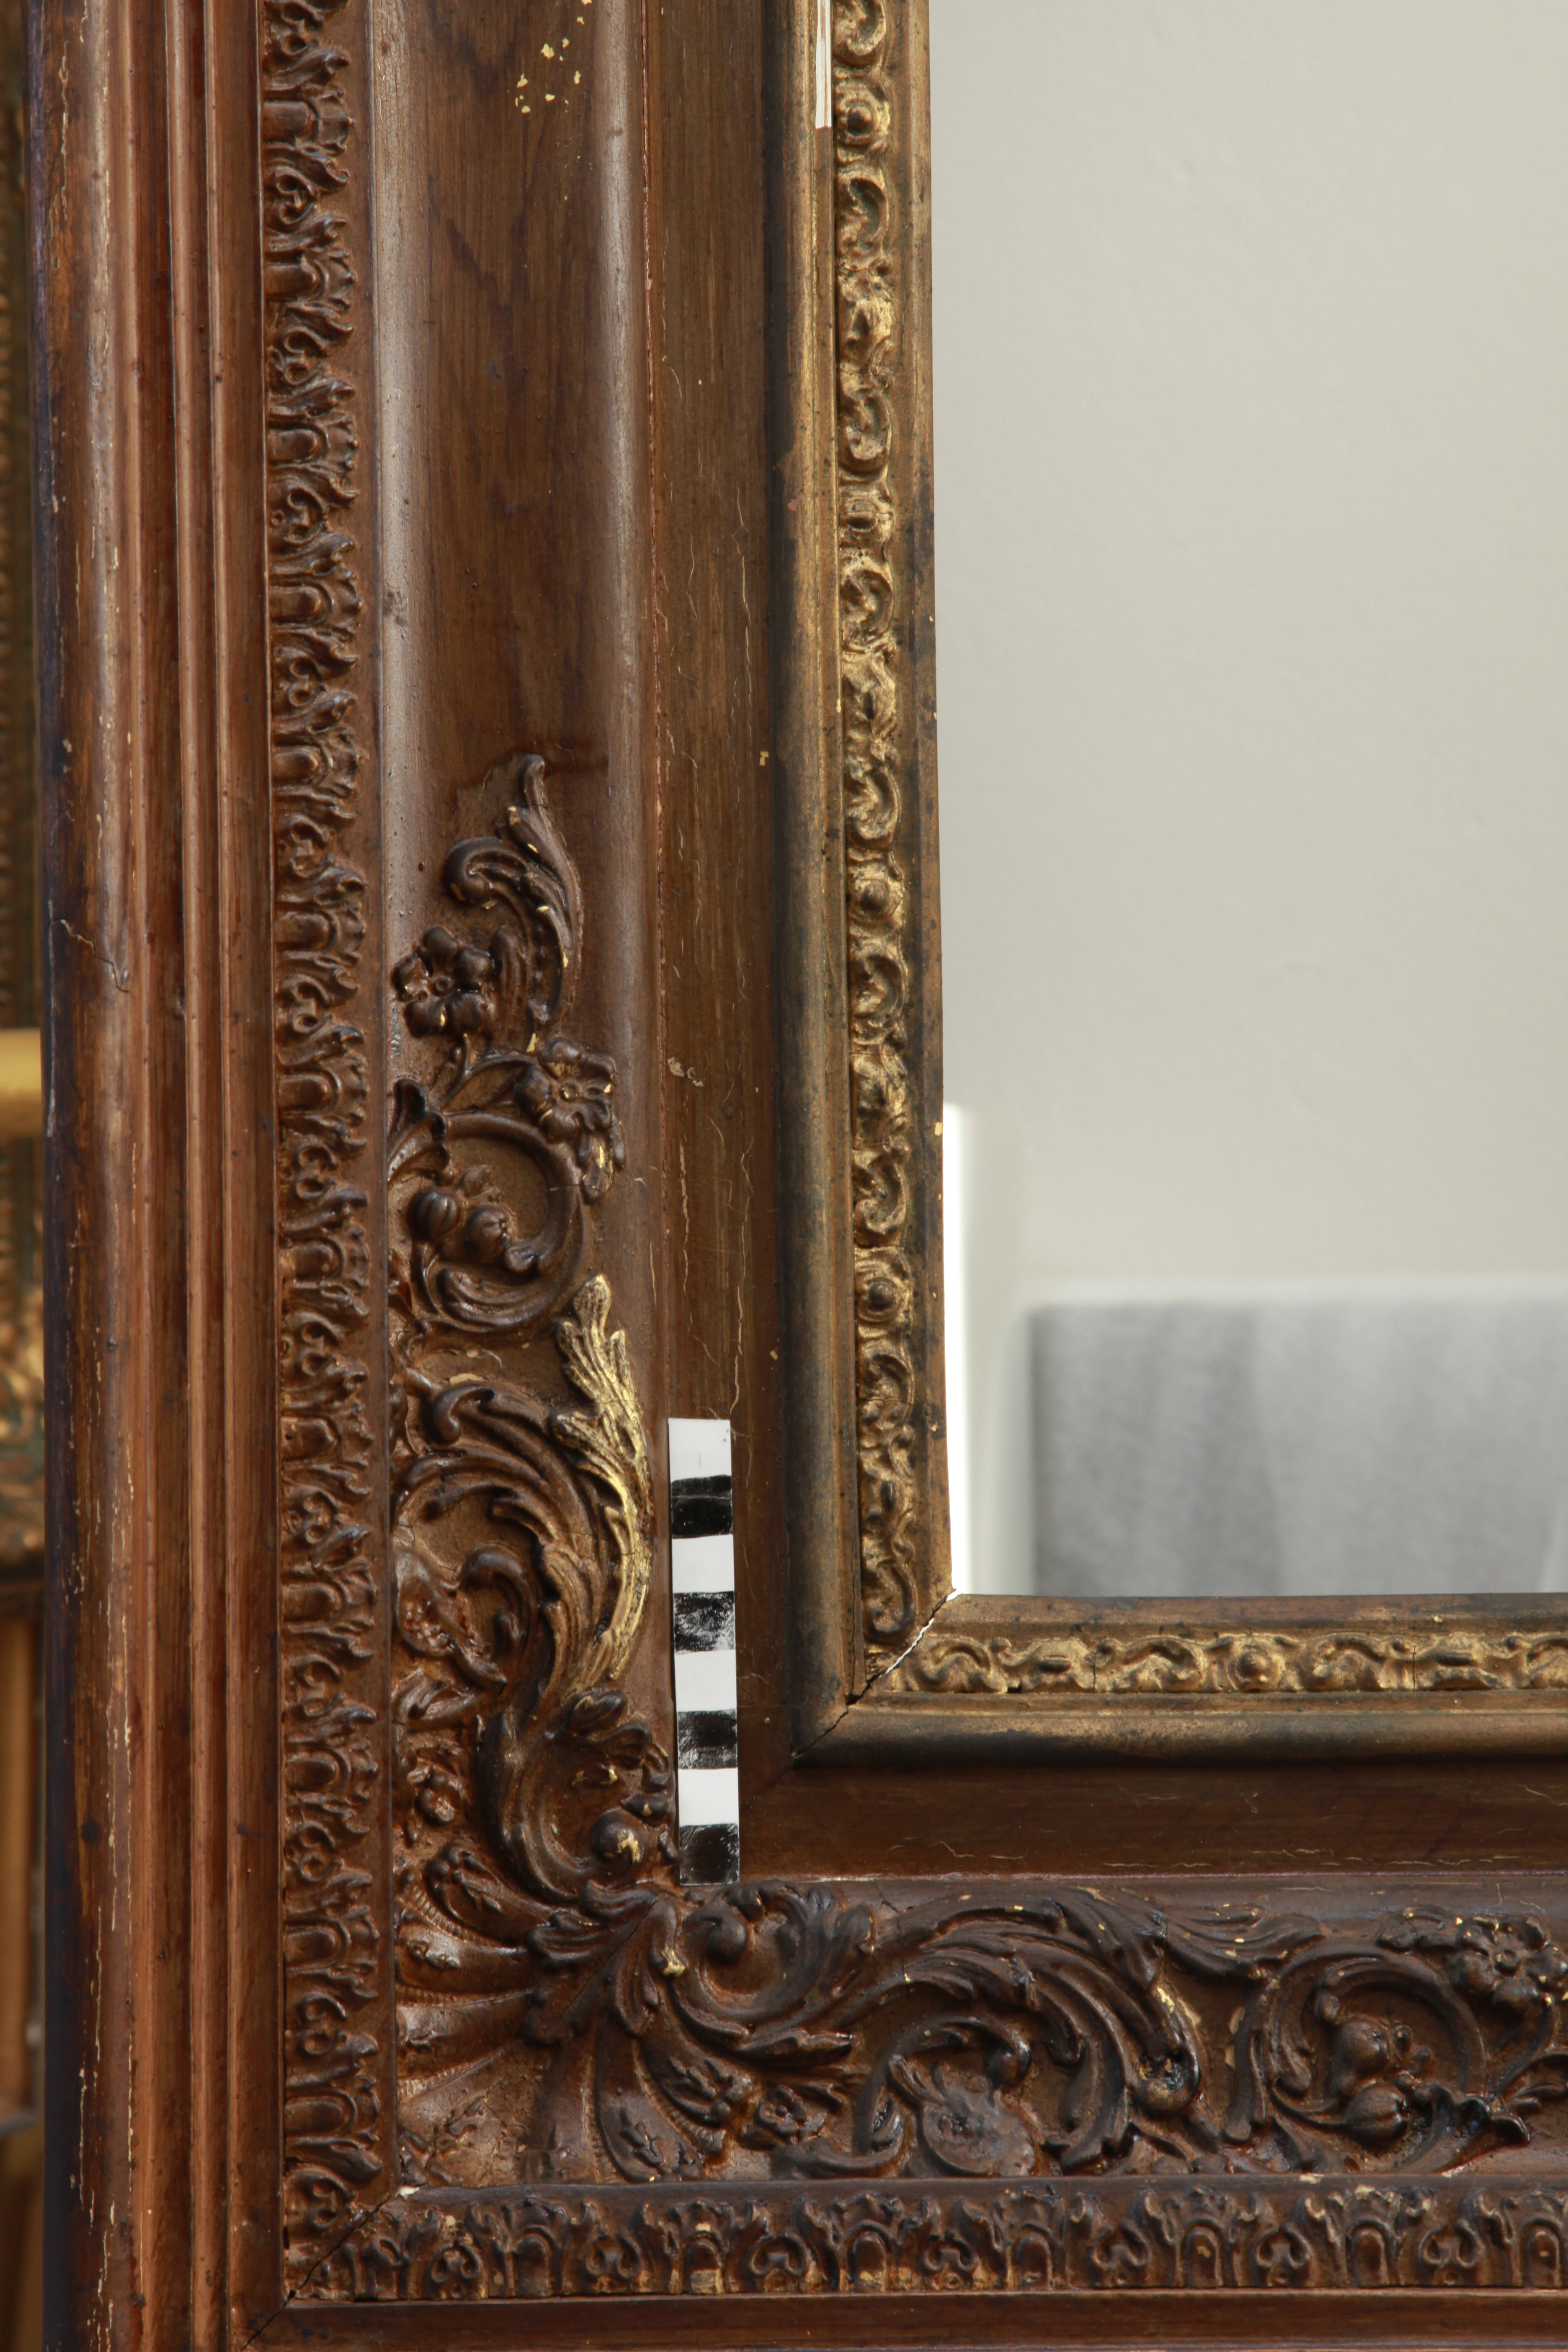 Bilderrahmen | Kunstkonservierung